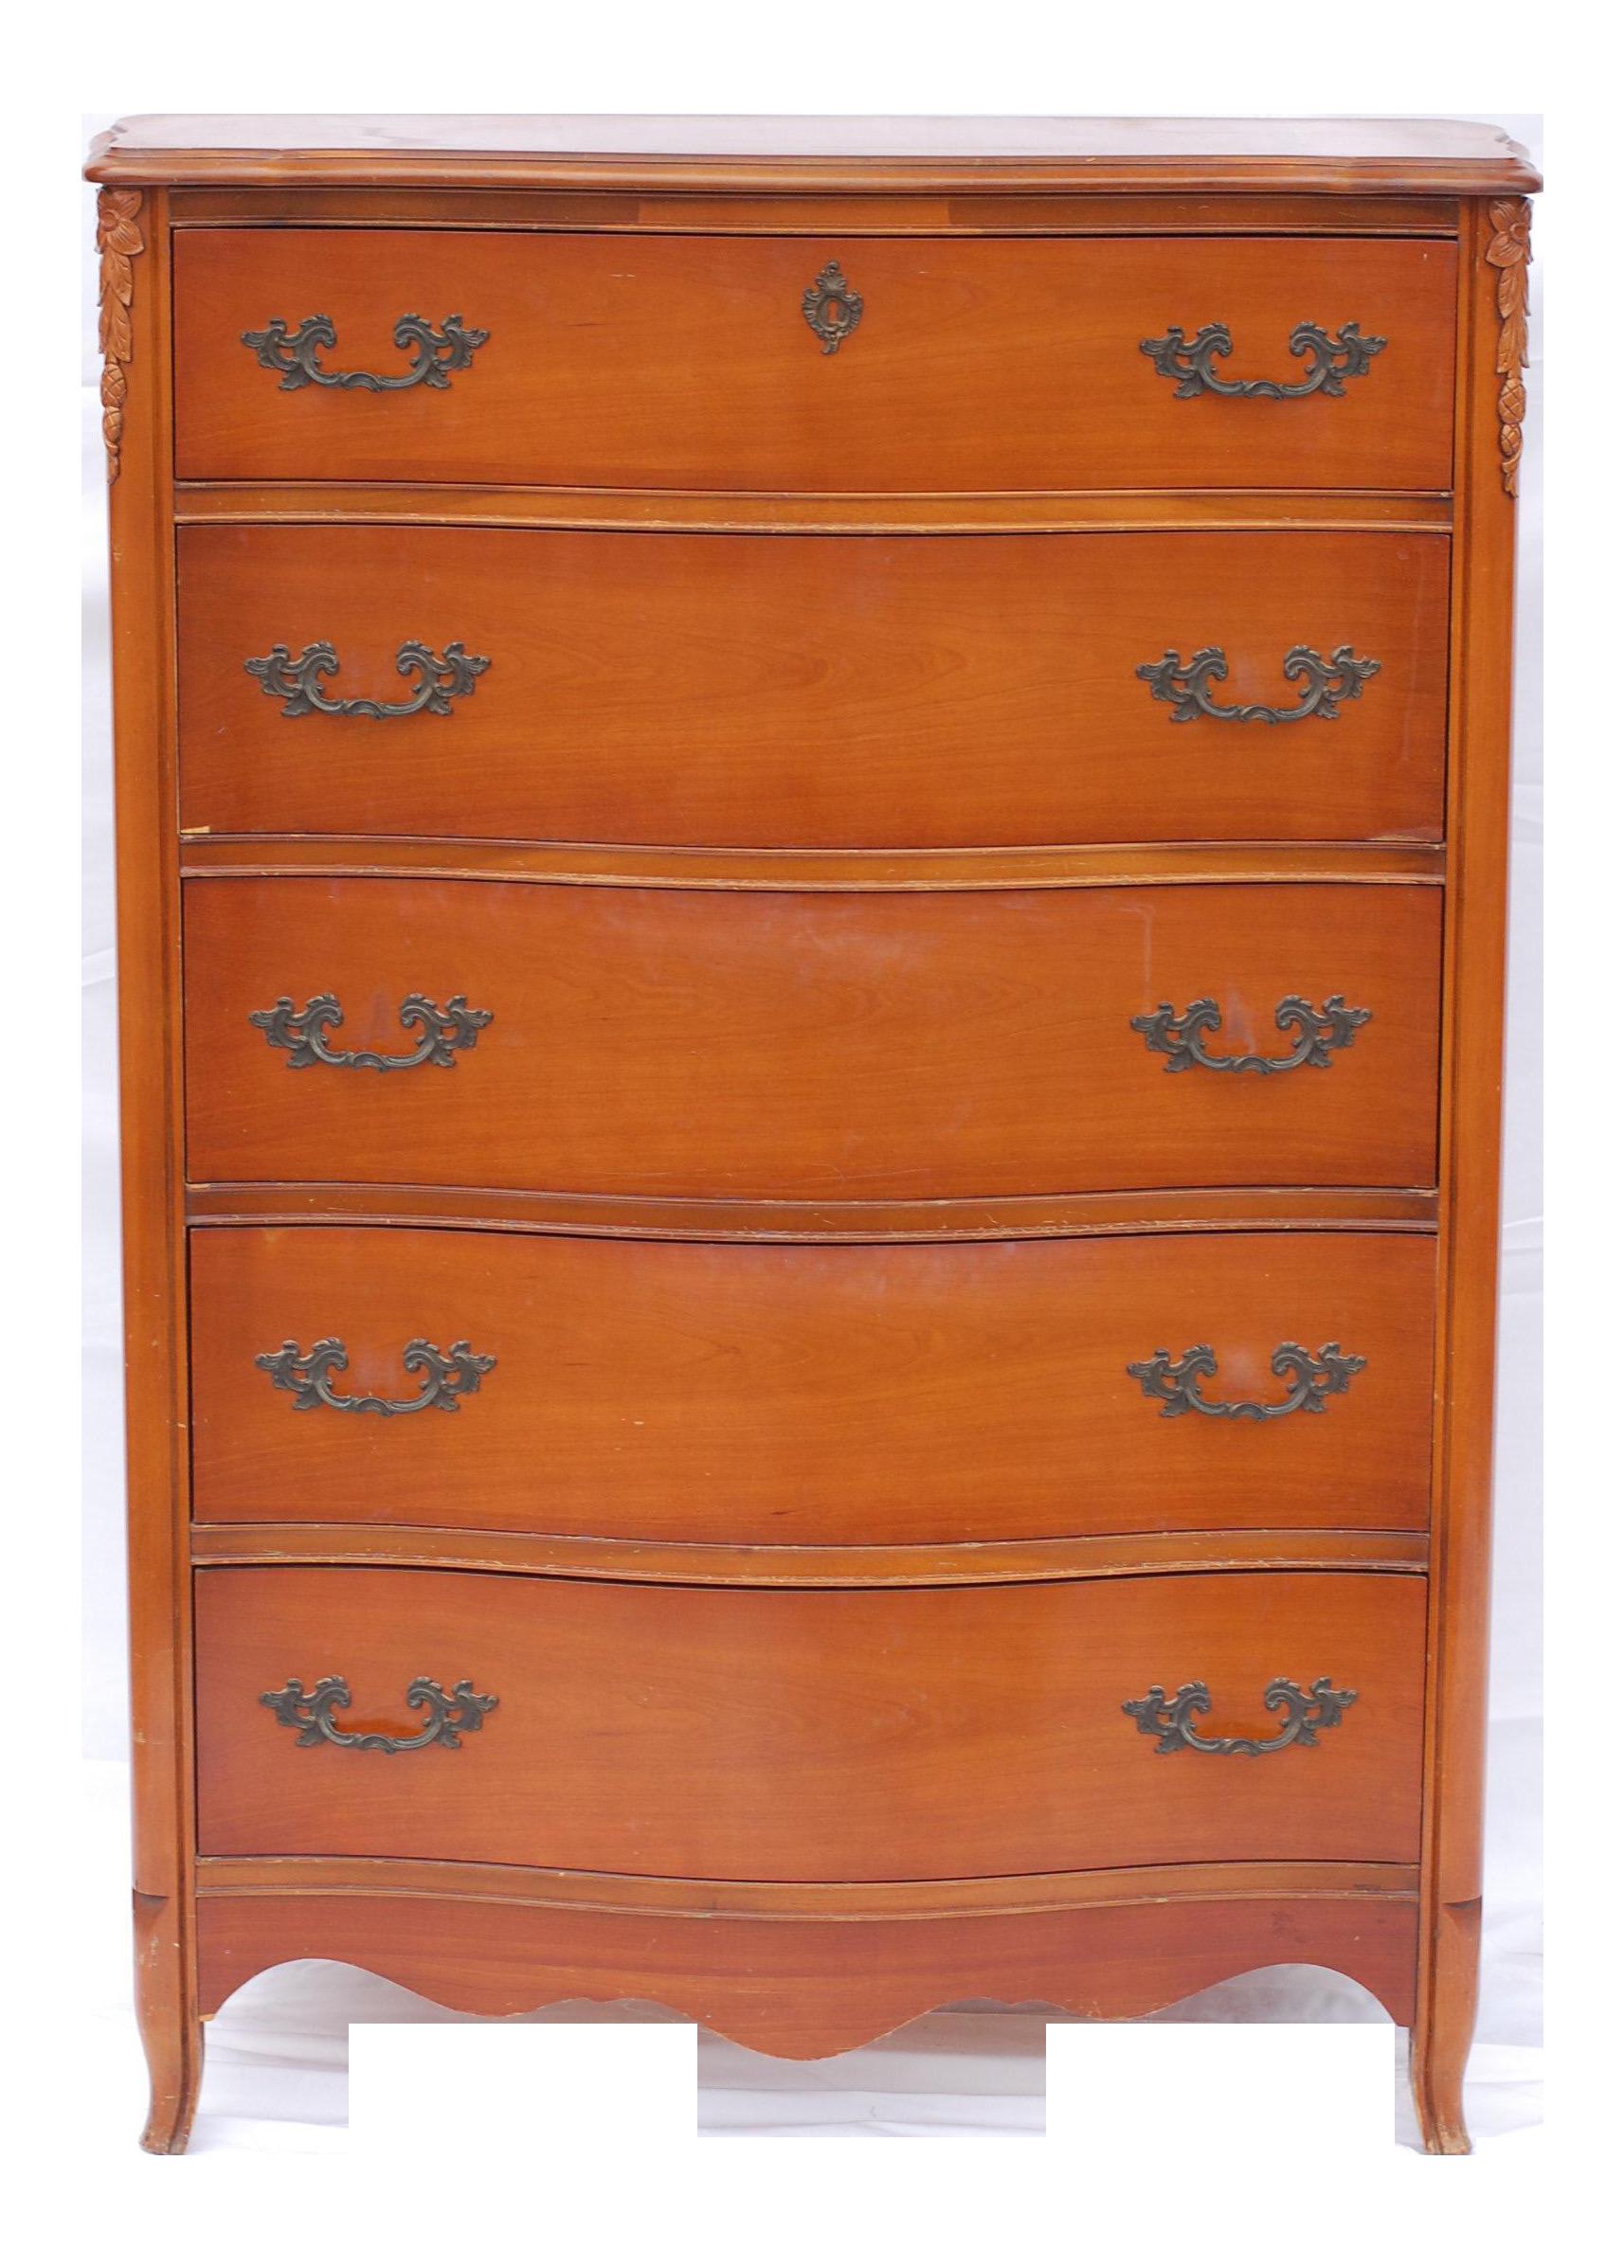 Bassett Furniture Antique French Provincial Dresser